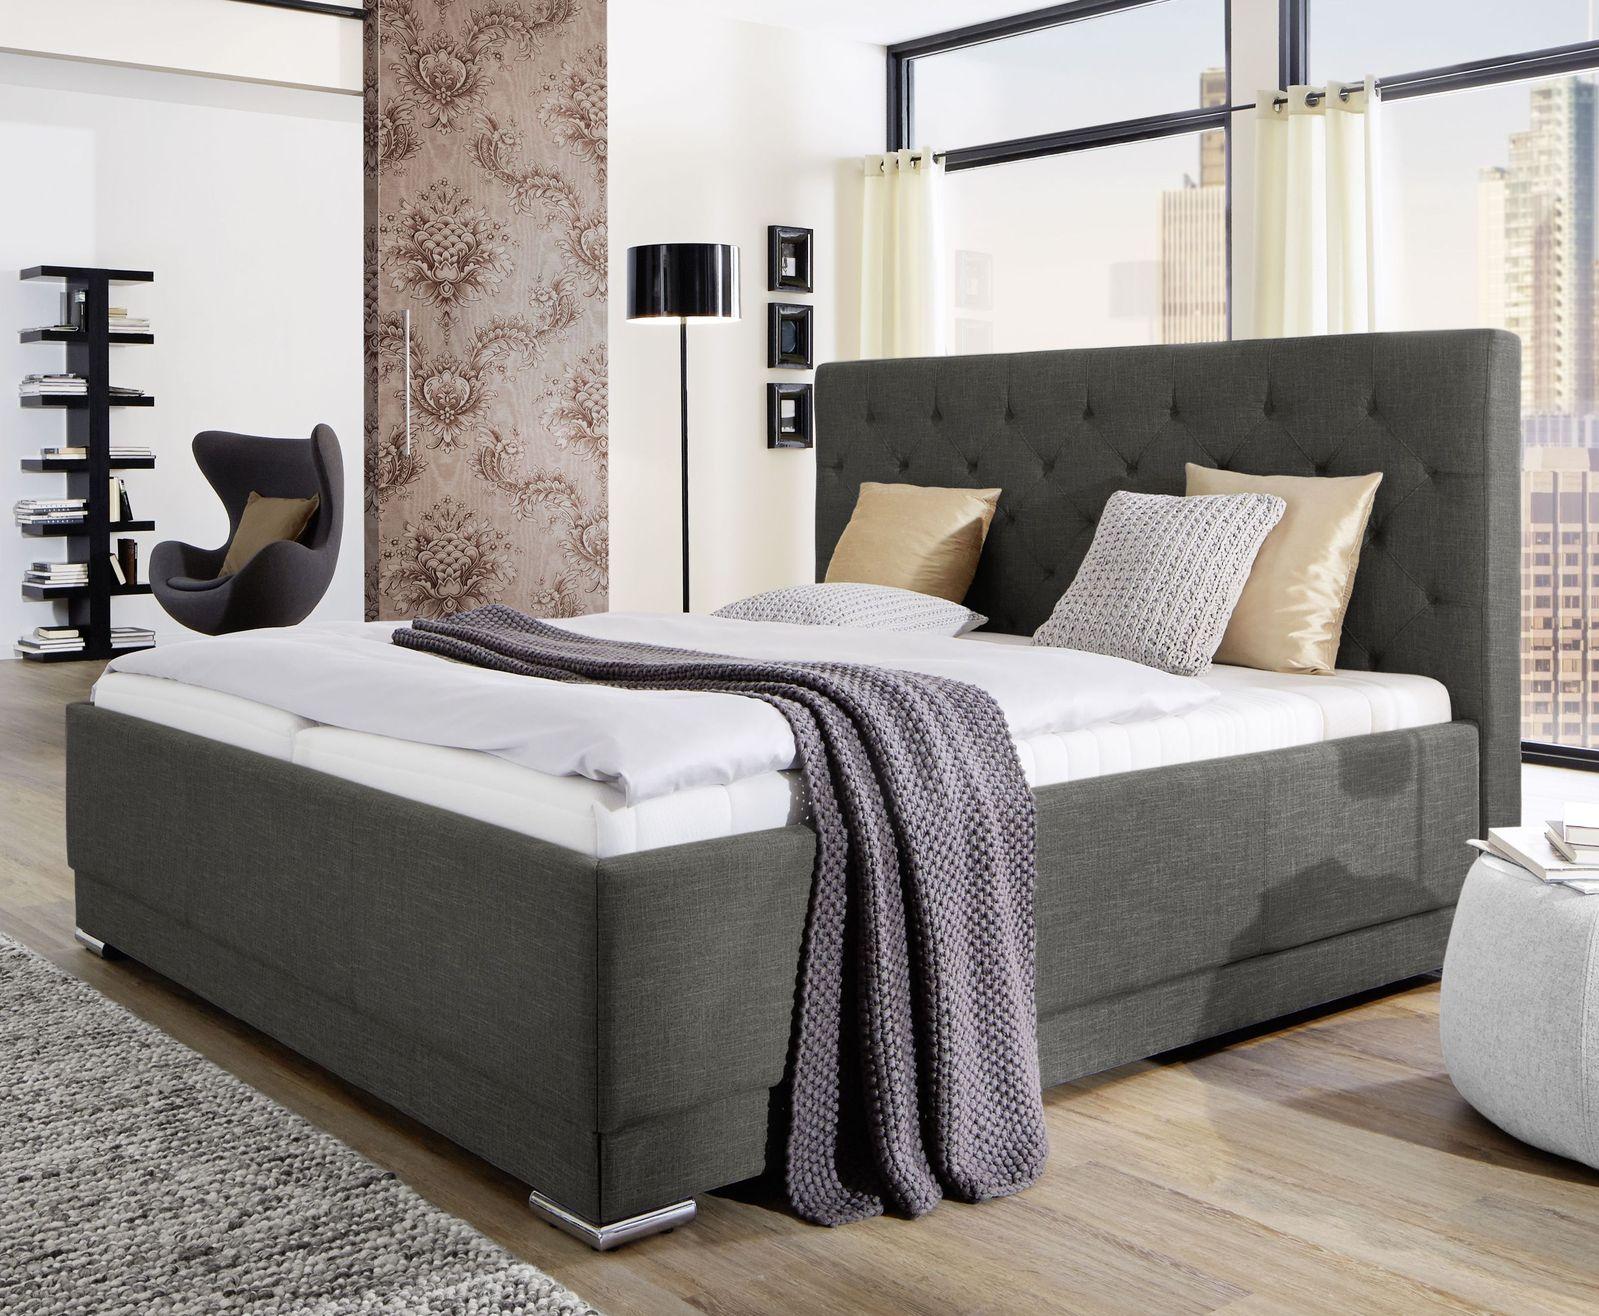 g nstiges polsterbett in grau mit gestepptem kopfteil atella. Black Bedroom Furniture Sets. Home Design Ideas